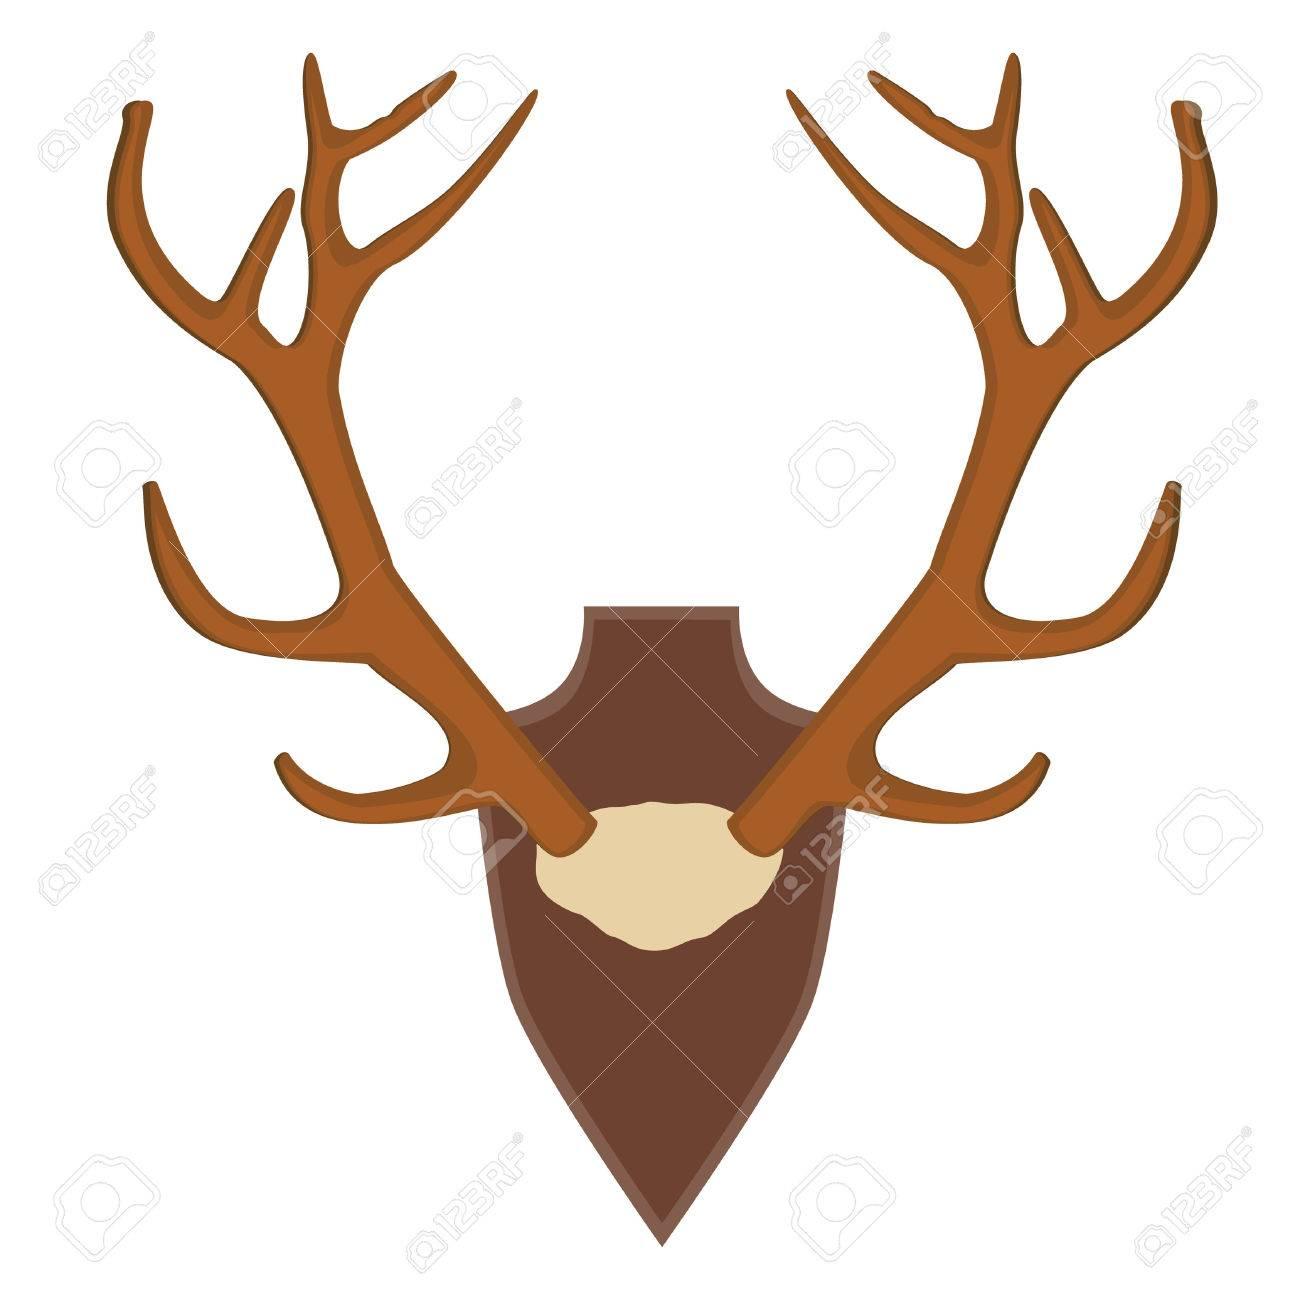 1300x1300 Illustration Of Deer, Antler Horns. Animal Horn Royalty Free